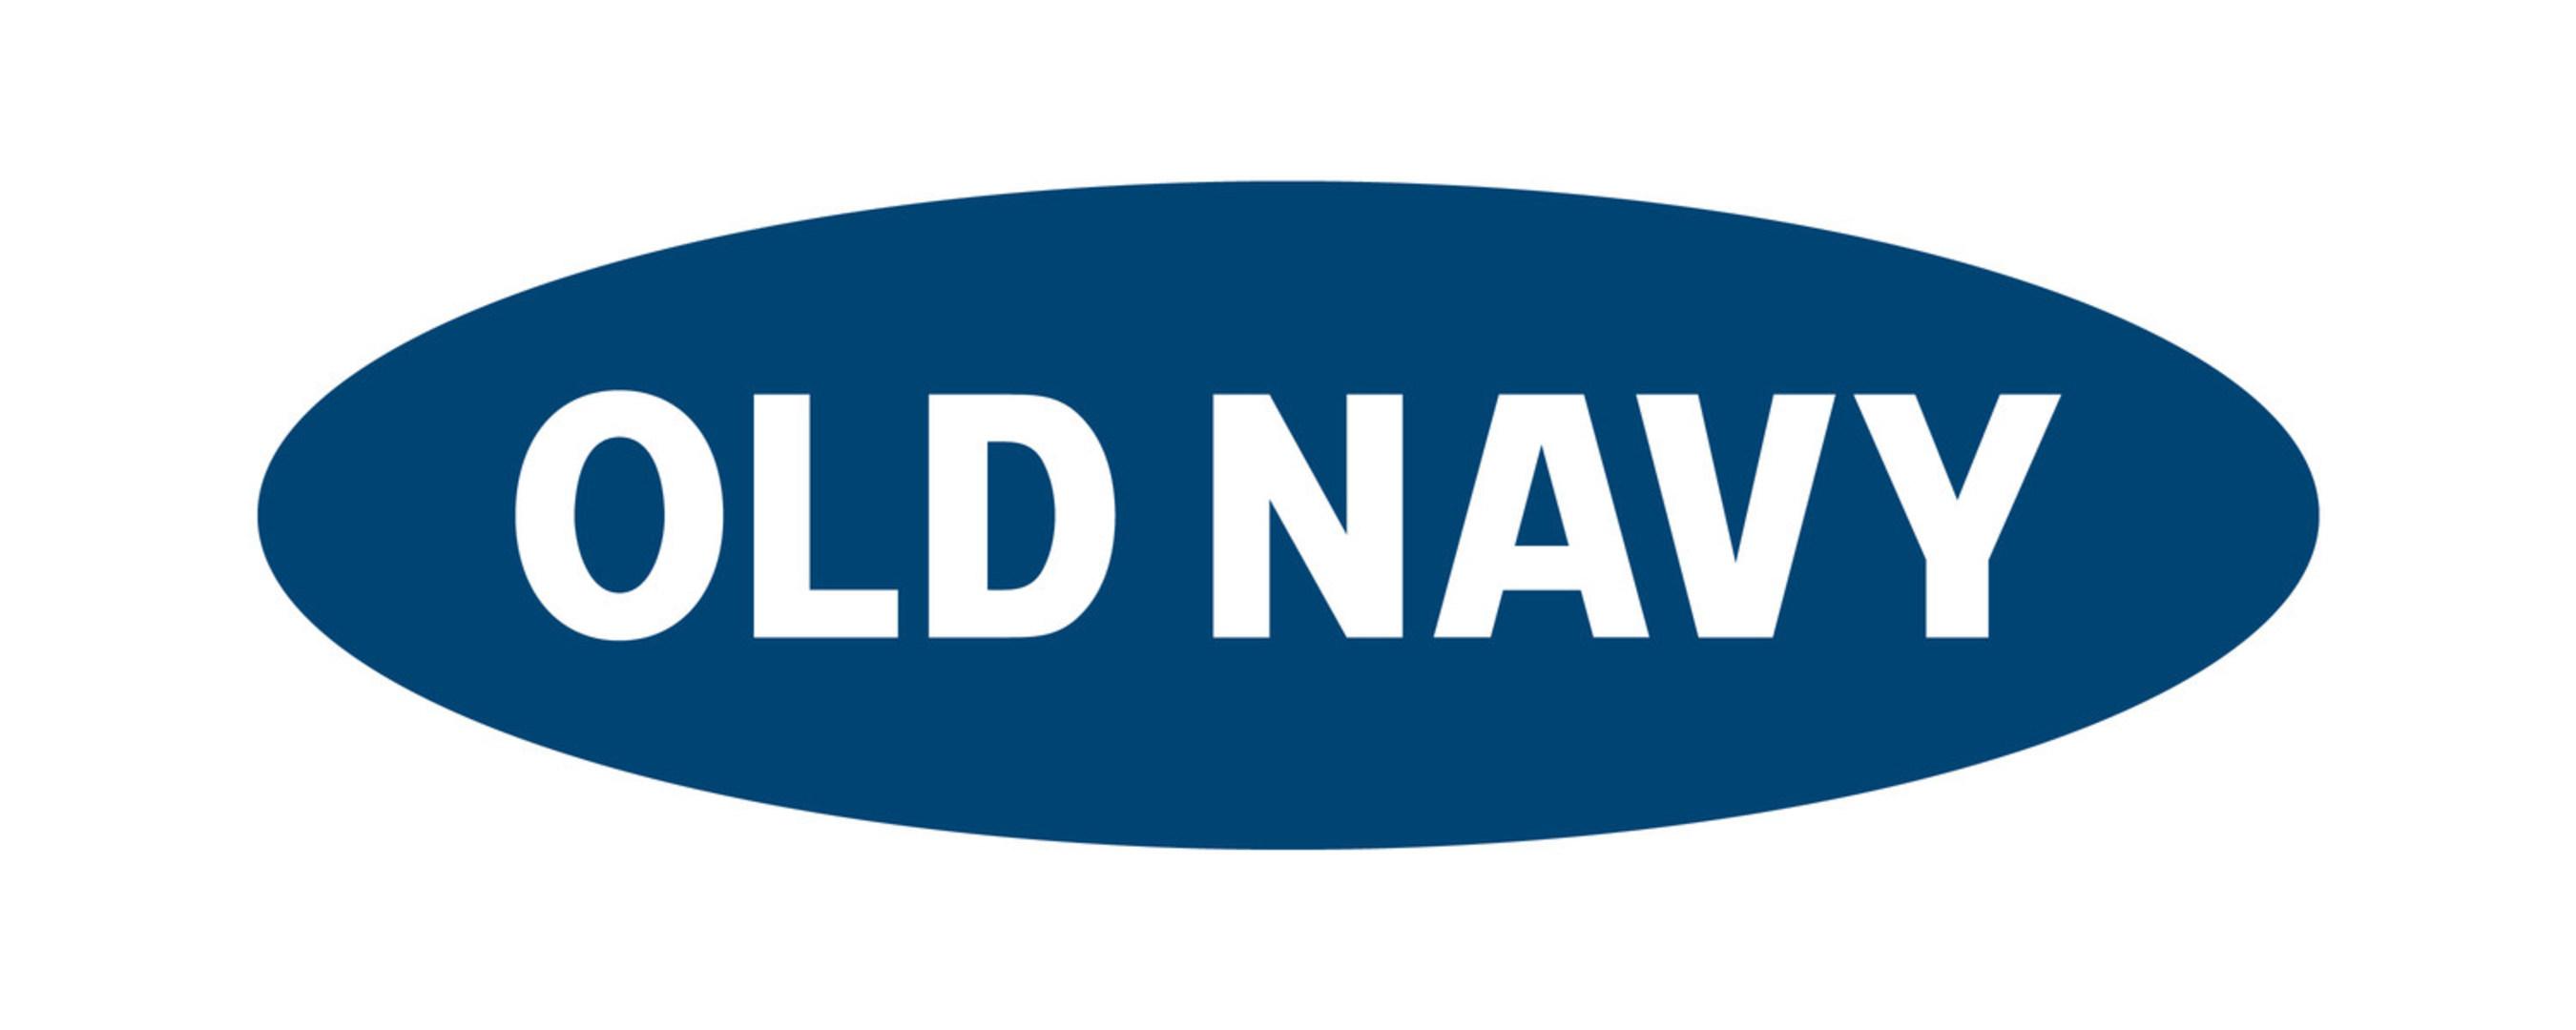 Old Navy Donates $1 Million To Boys & Girls Clubs On